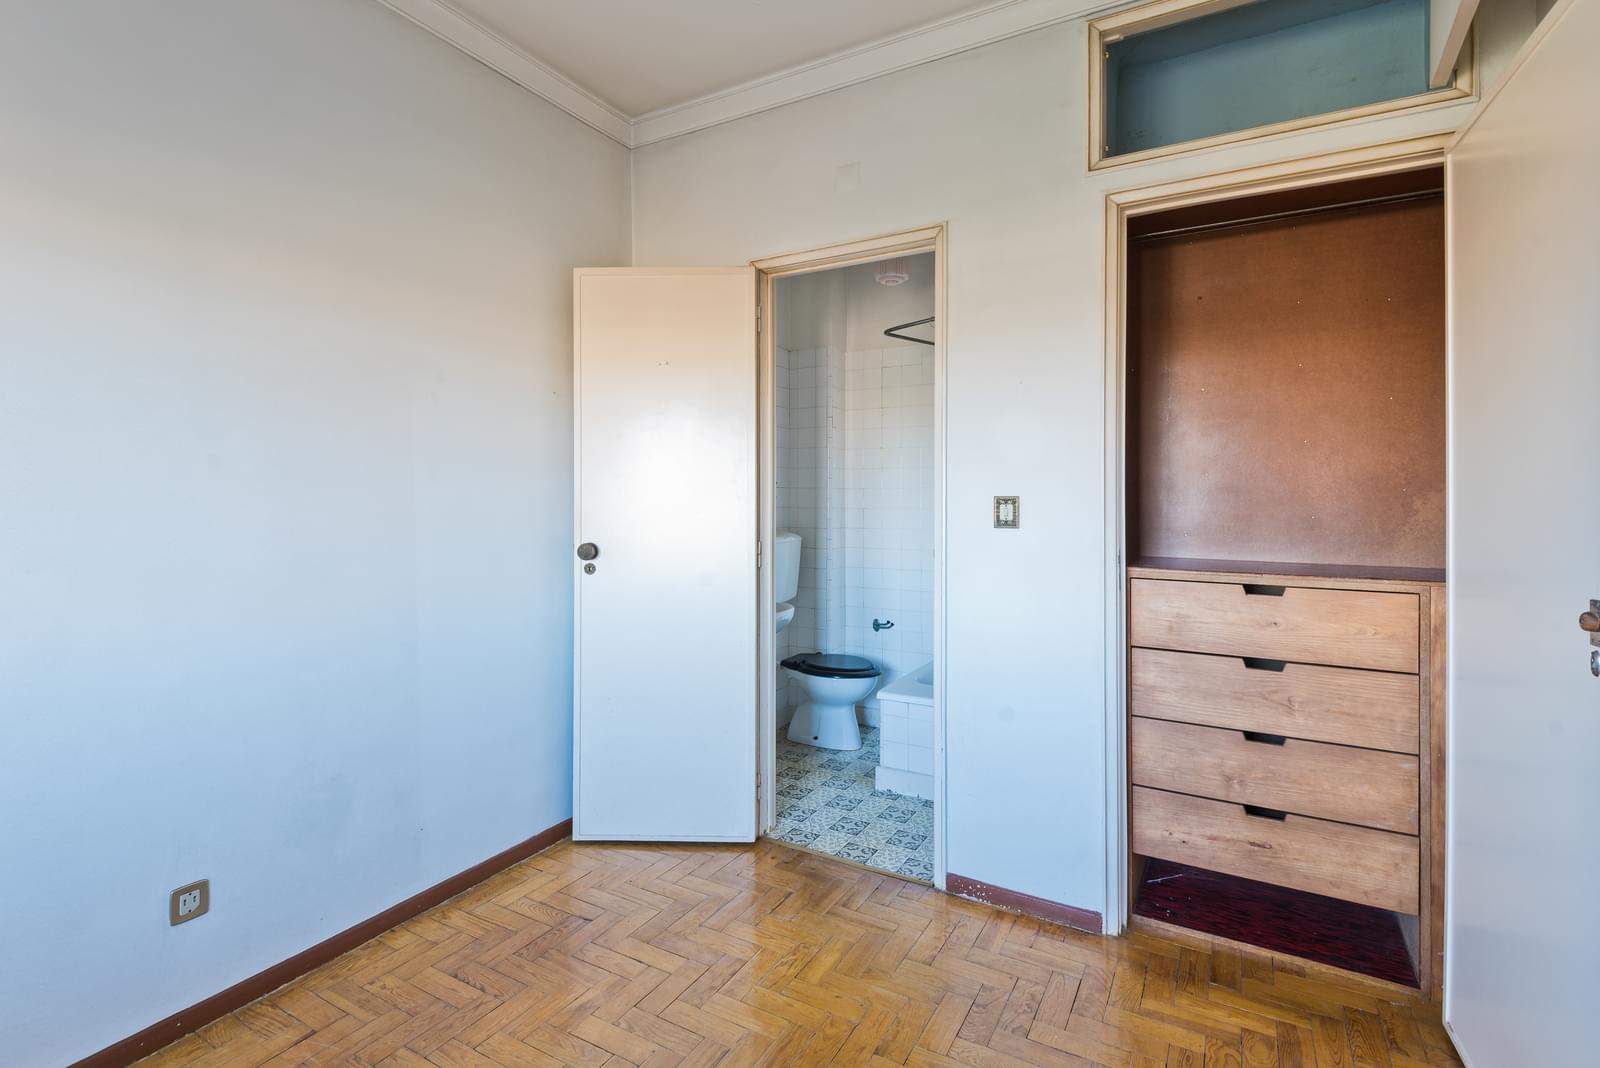 pf18965-apartamento-t2-1-cascais-c13f4c41-273c-4d41-bf5e-8e4fb29f908a